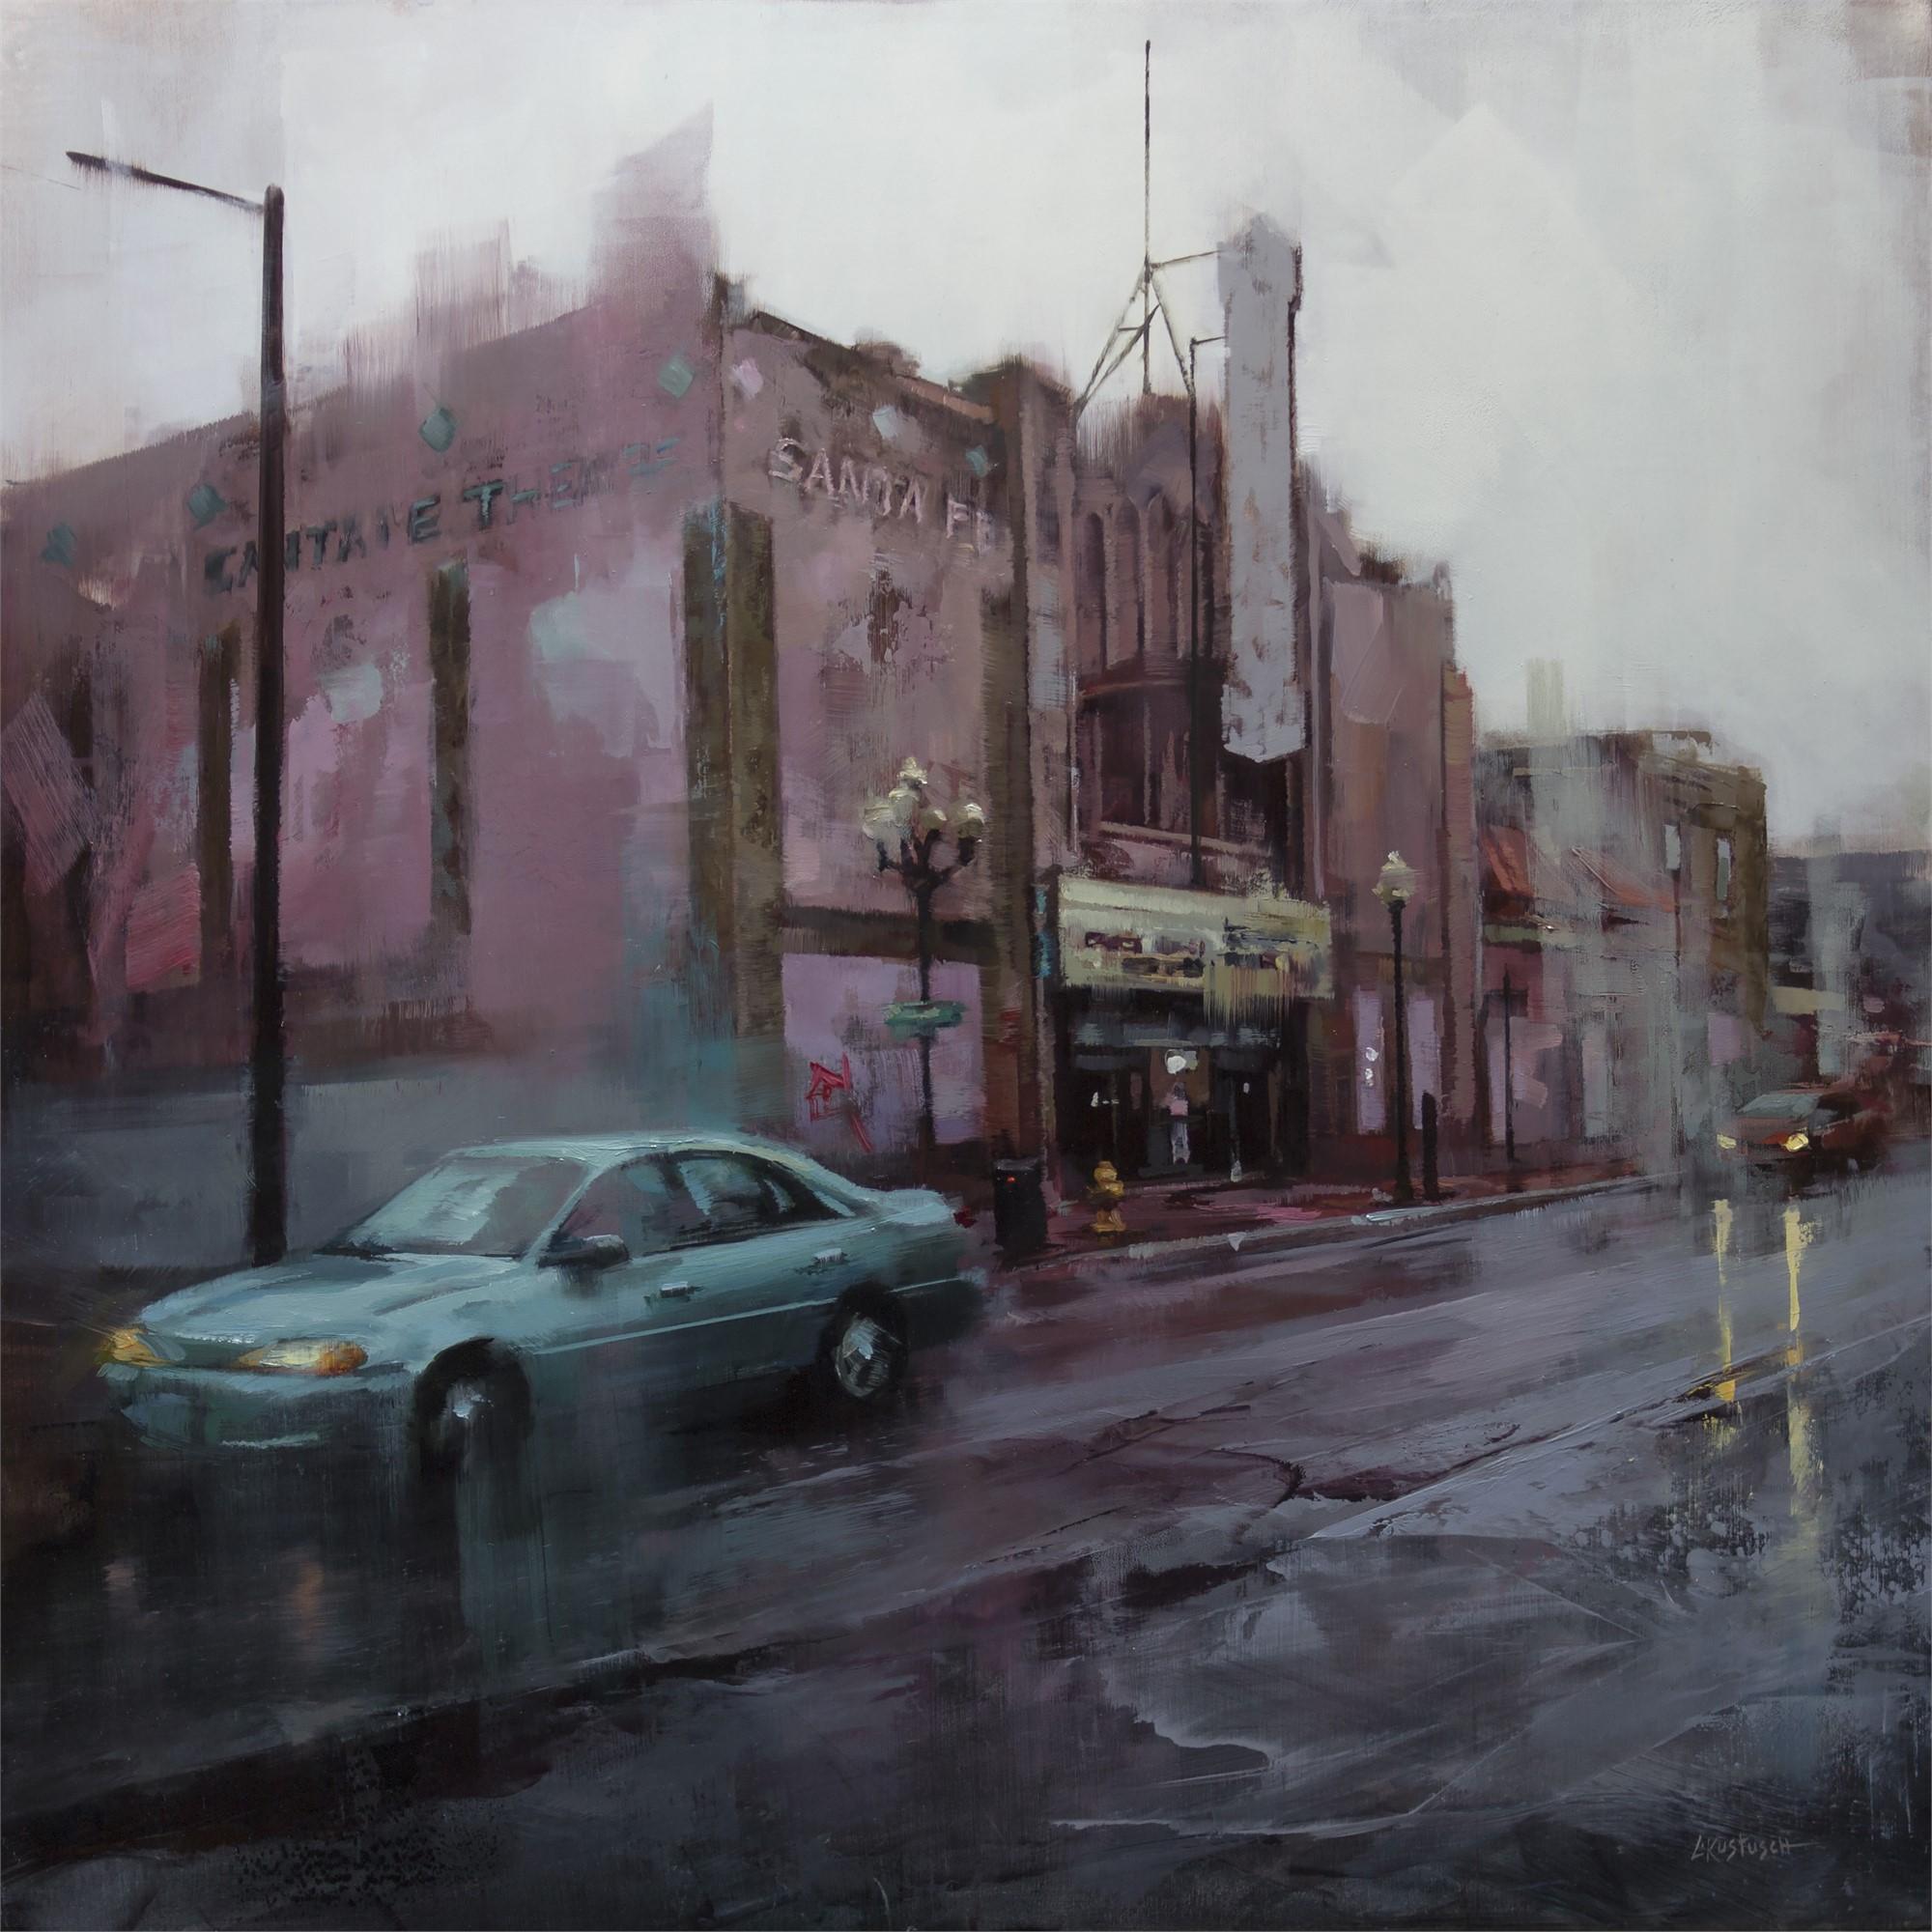 Santa Fe Theatre by Lindsey Kustusch